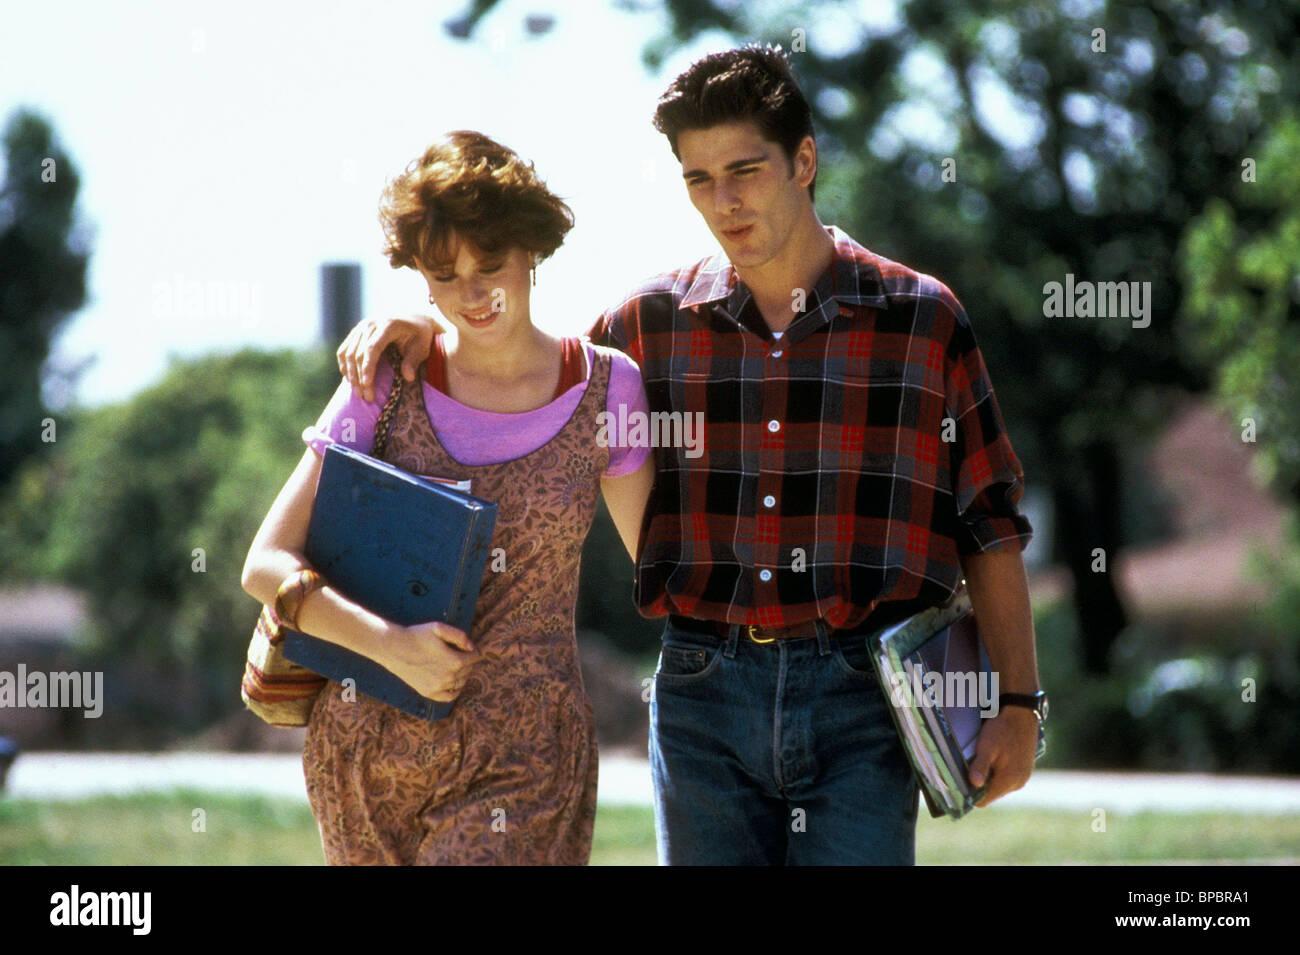 MOLLY RINGWALD & MICHAEL SCHOEFFLING SIXTEEN CANDLES (1984) - Stock Image